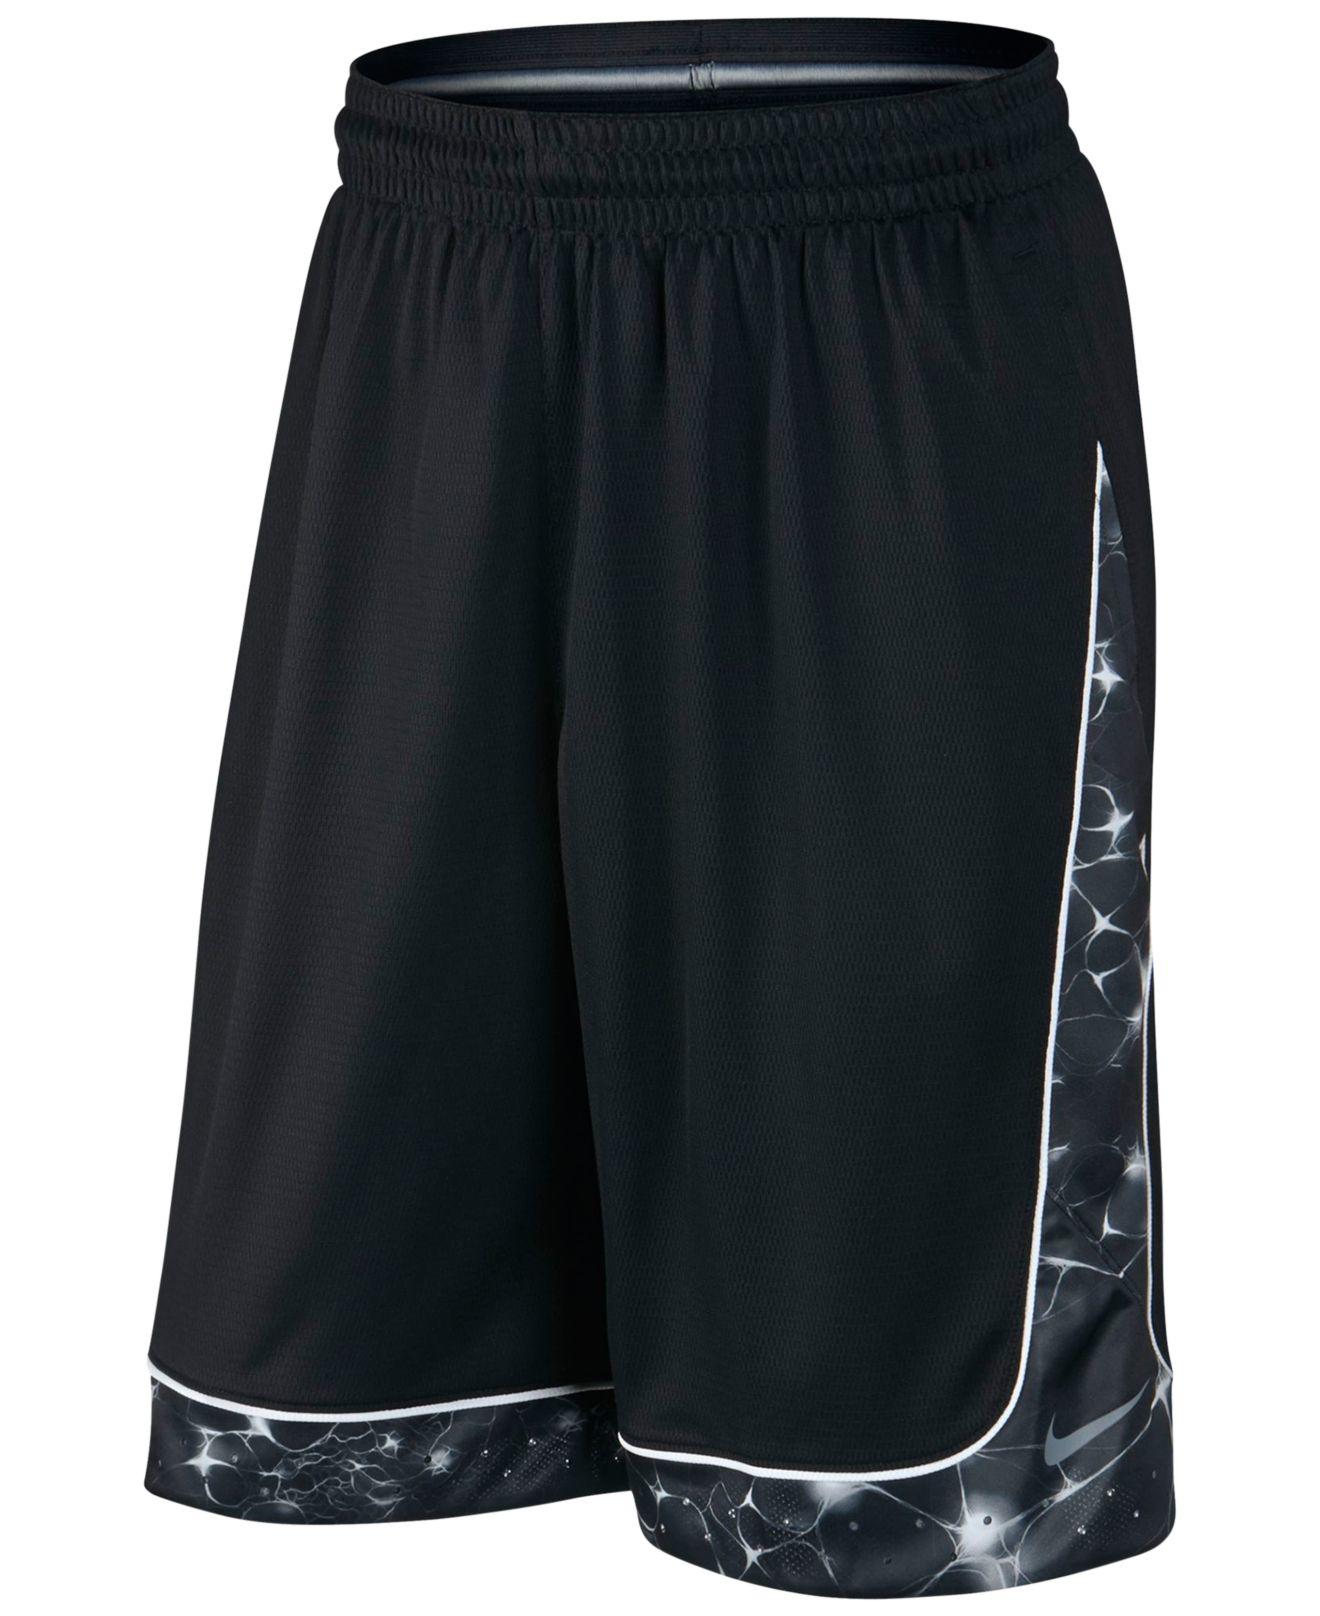 Nike Lebron Helix Elite Dri-fit Basketball Shorts in Black ...